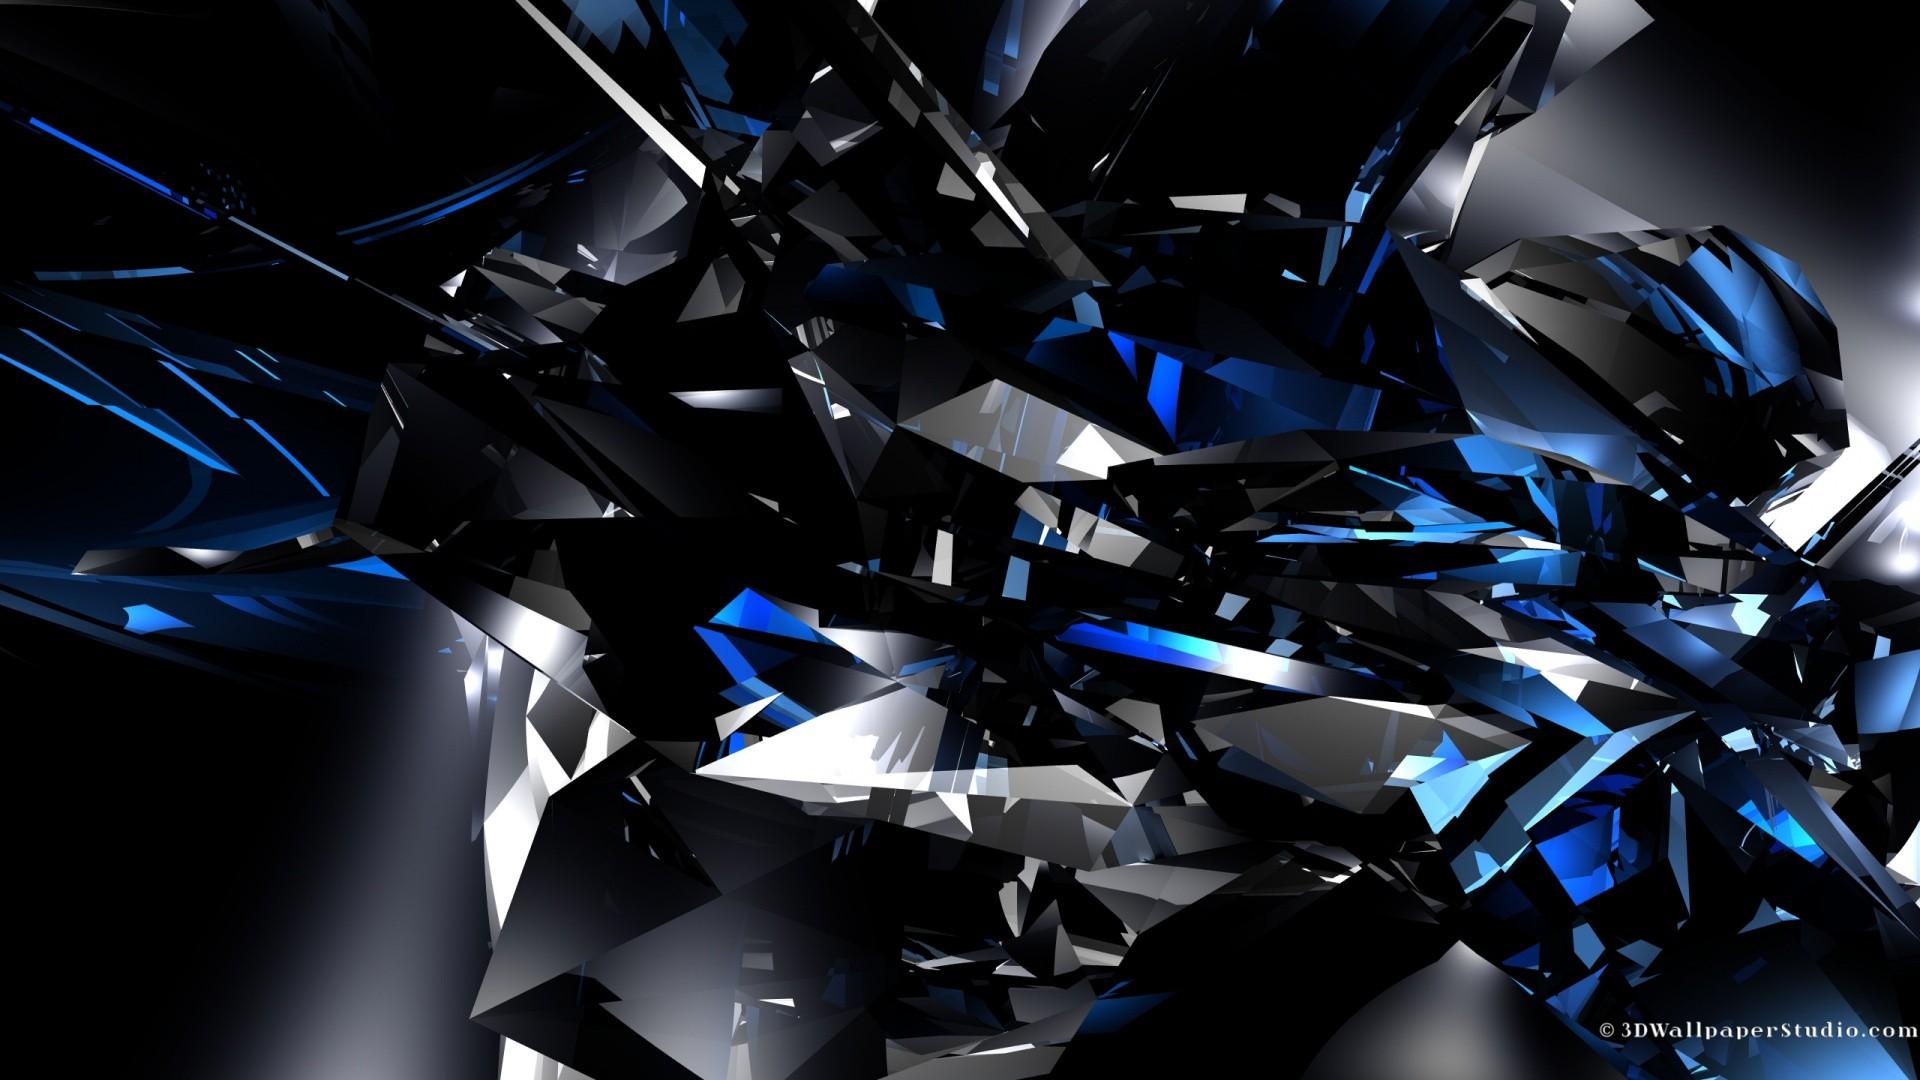 Blue Wallpaper 1920x1080 Abstract Blue Crystals Digital Art 3D 1920x1080